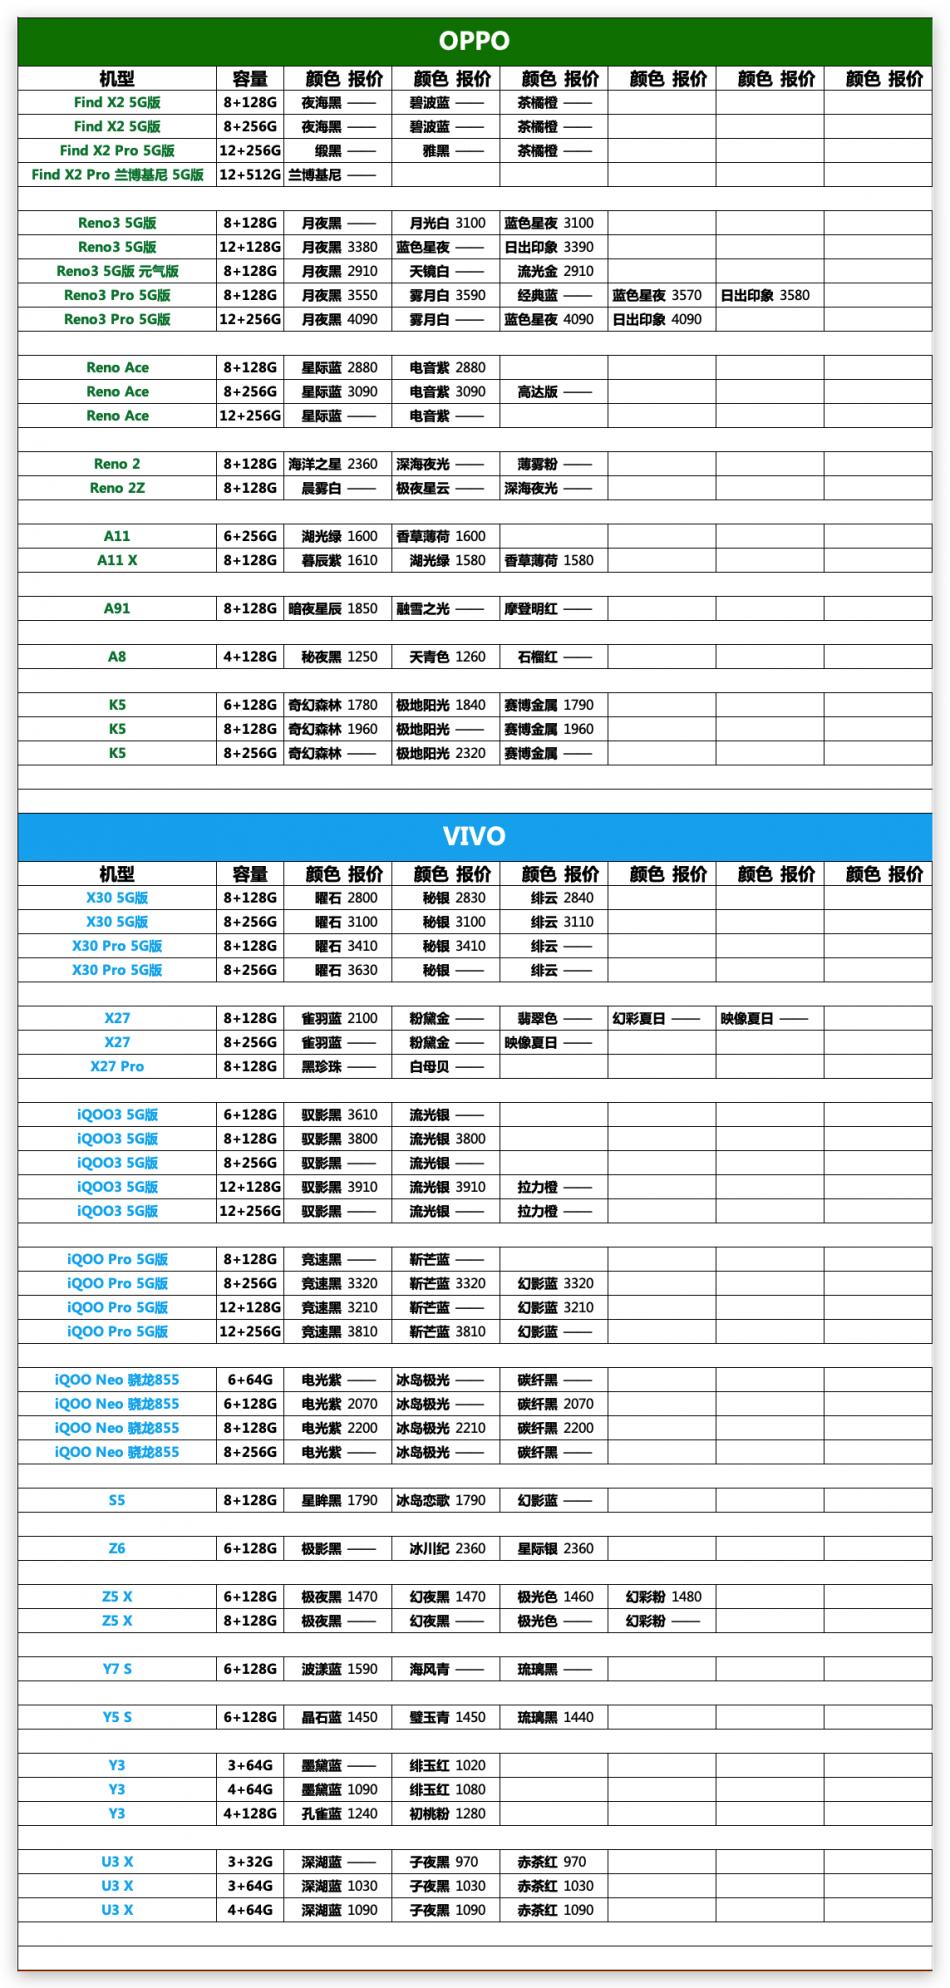 Xnip2020-03-24_12-11-04.png